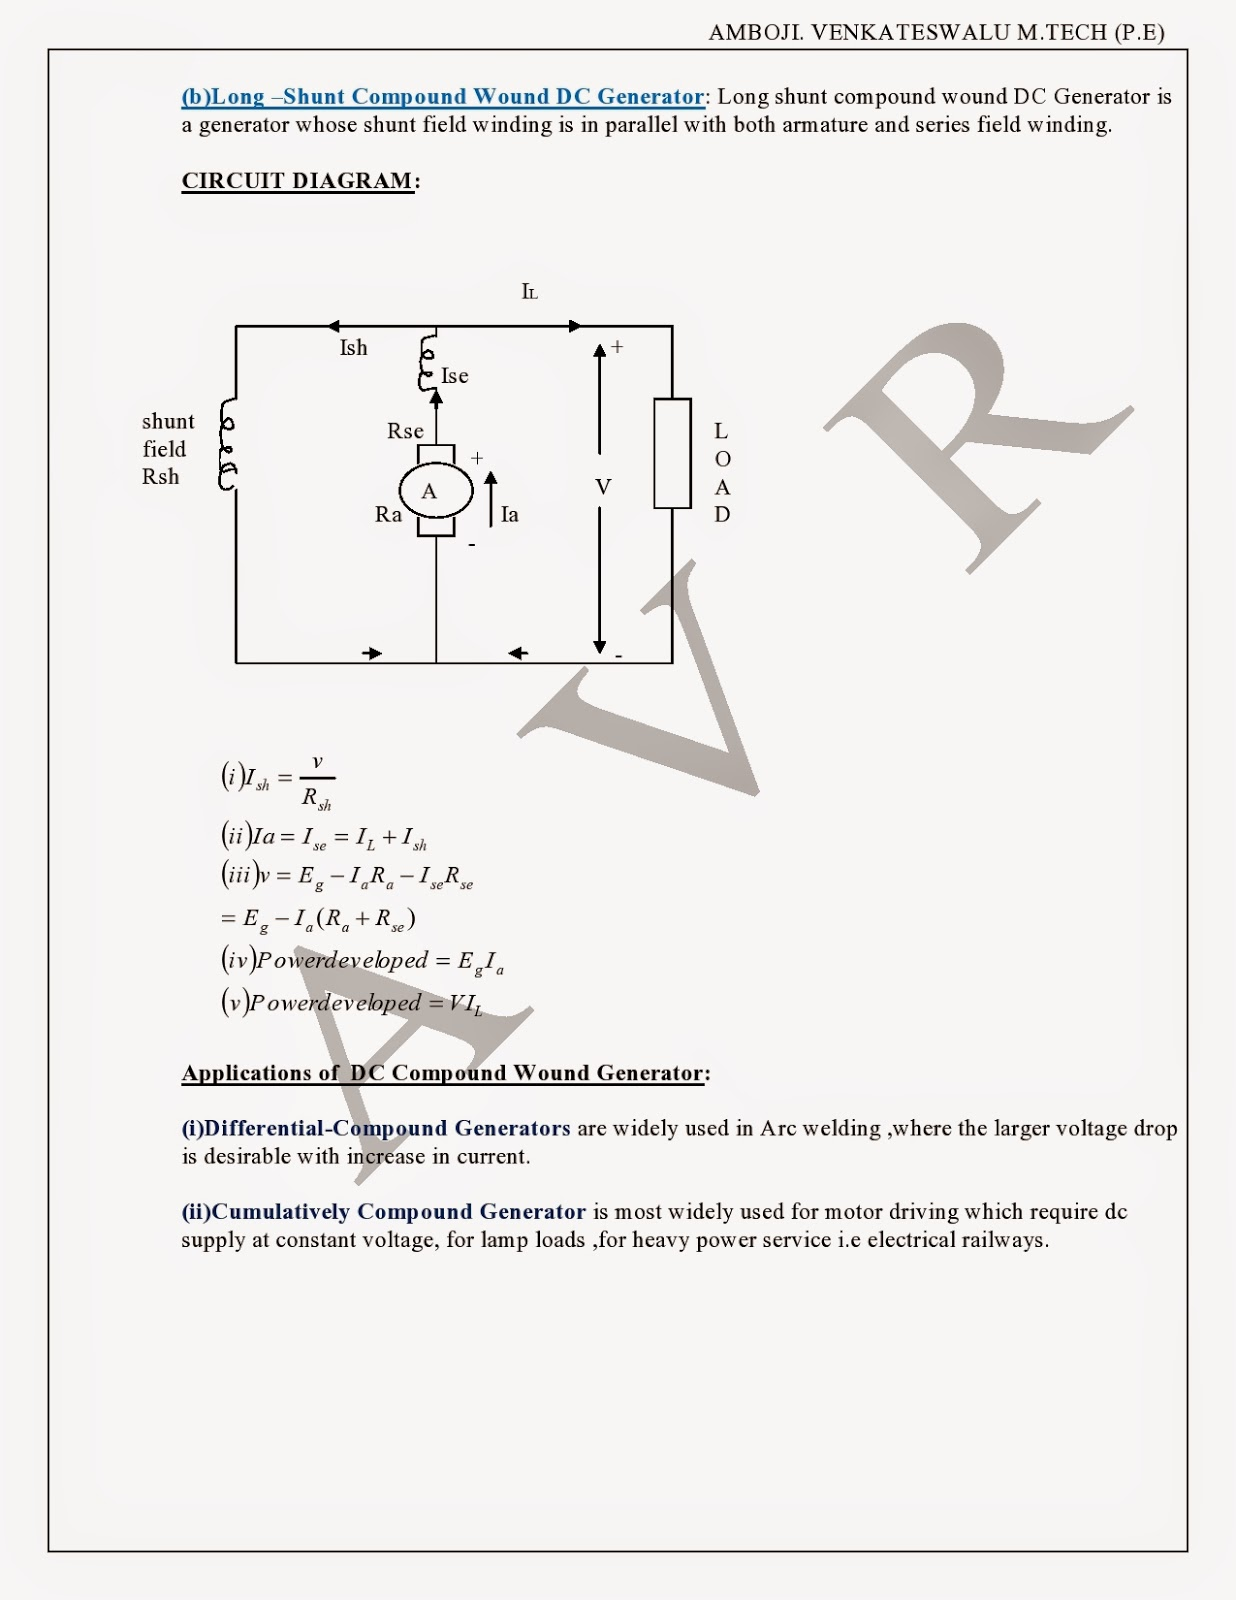 dc generators types of generators emf equation power flow diagram condition for max efficiency applications of dc generators [ 1236 x 1600 Pixel ]